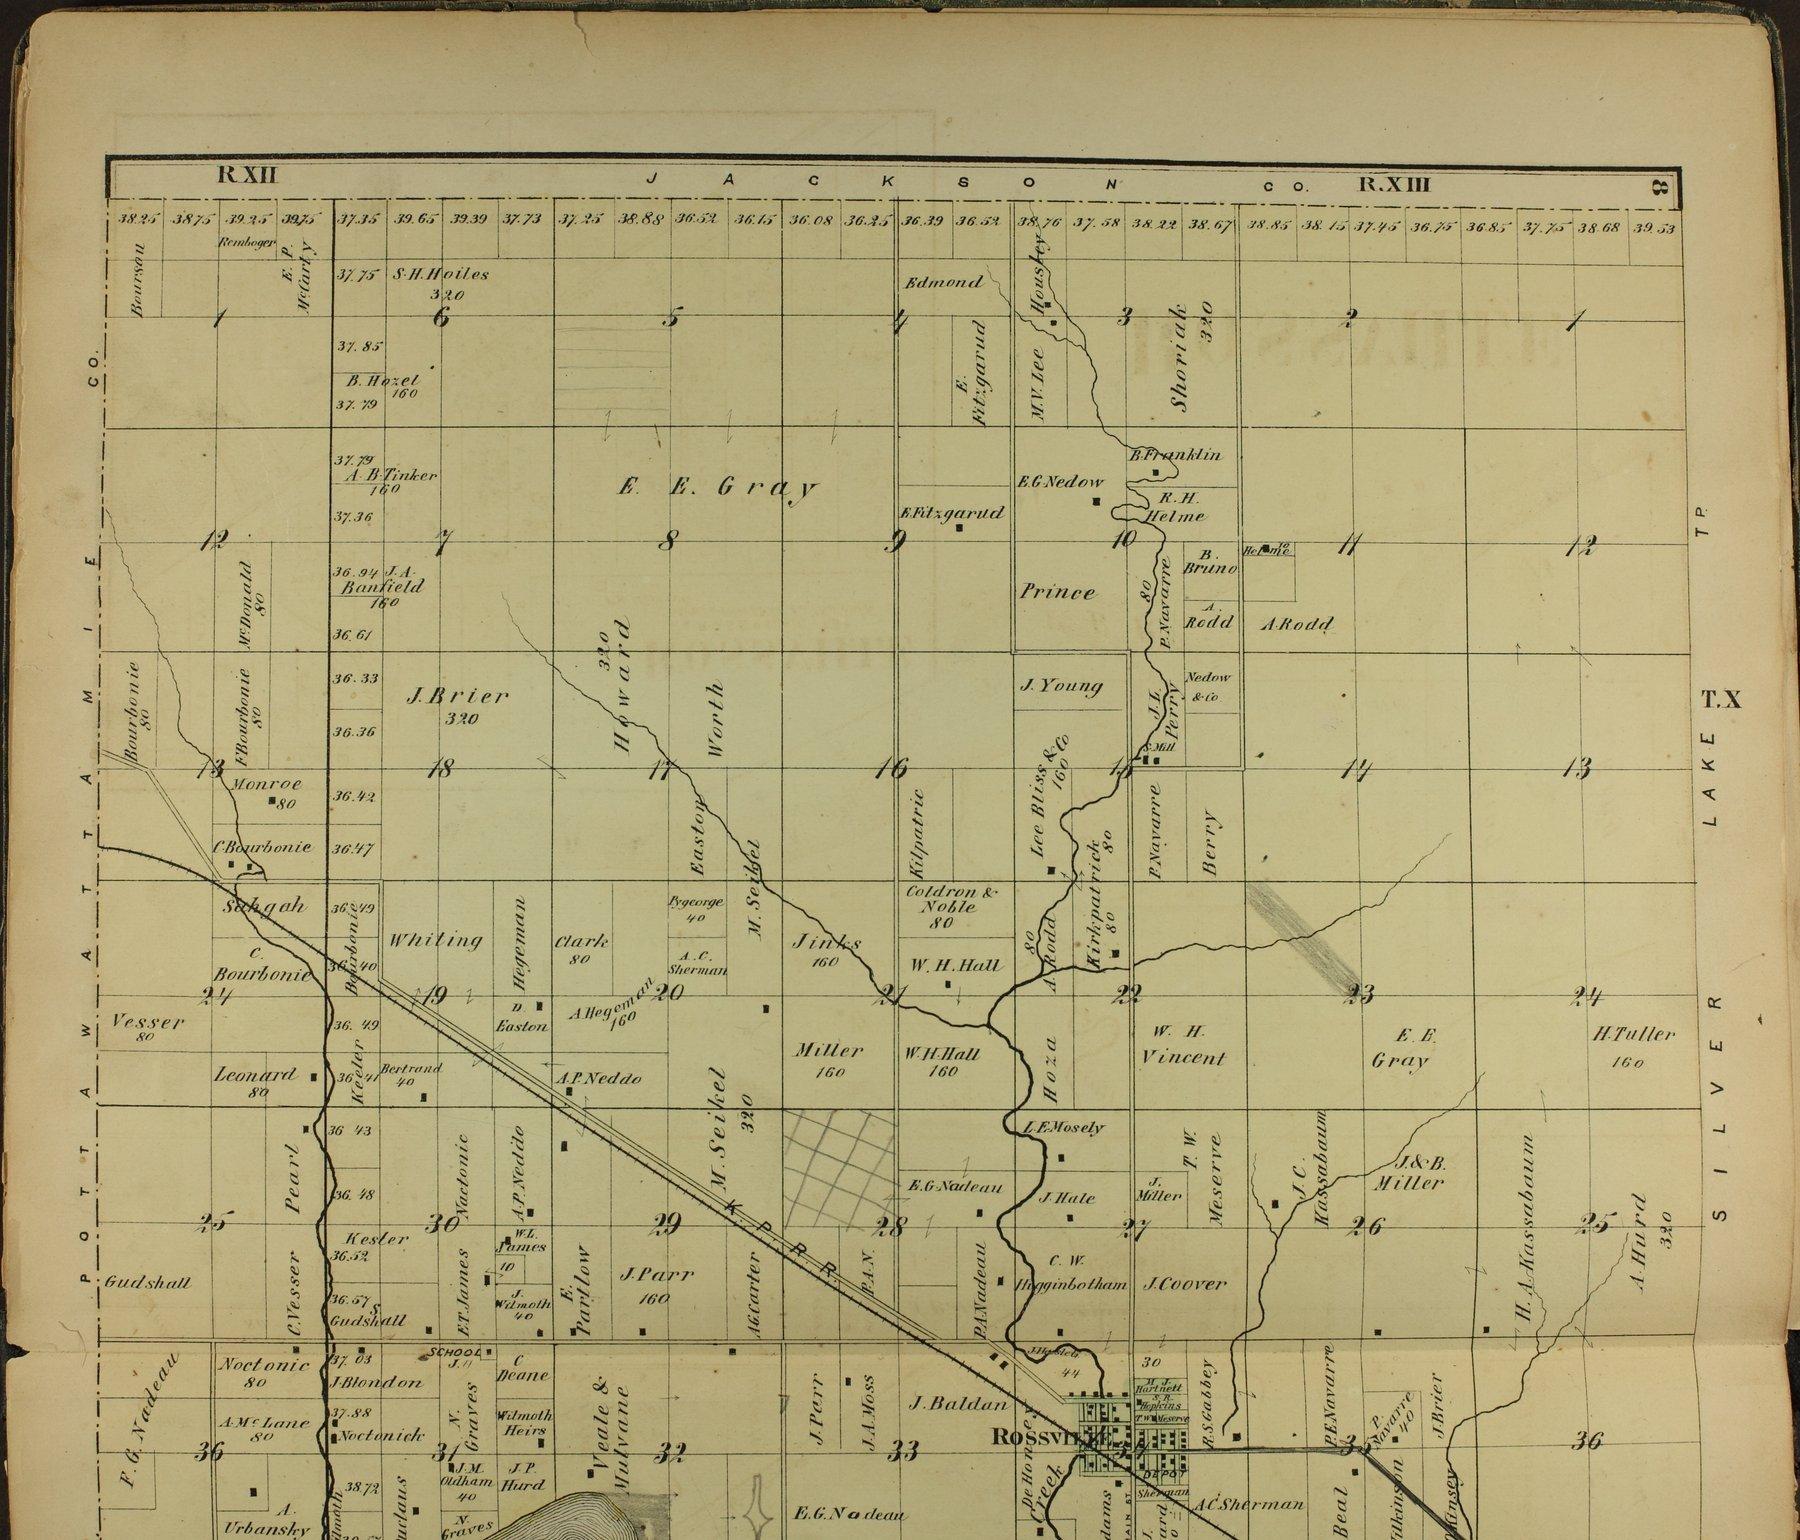 Atlas of Shawnee County, Kansas - 8